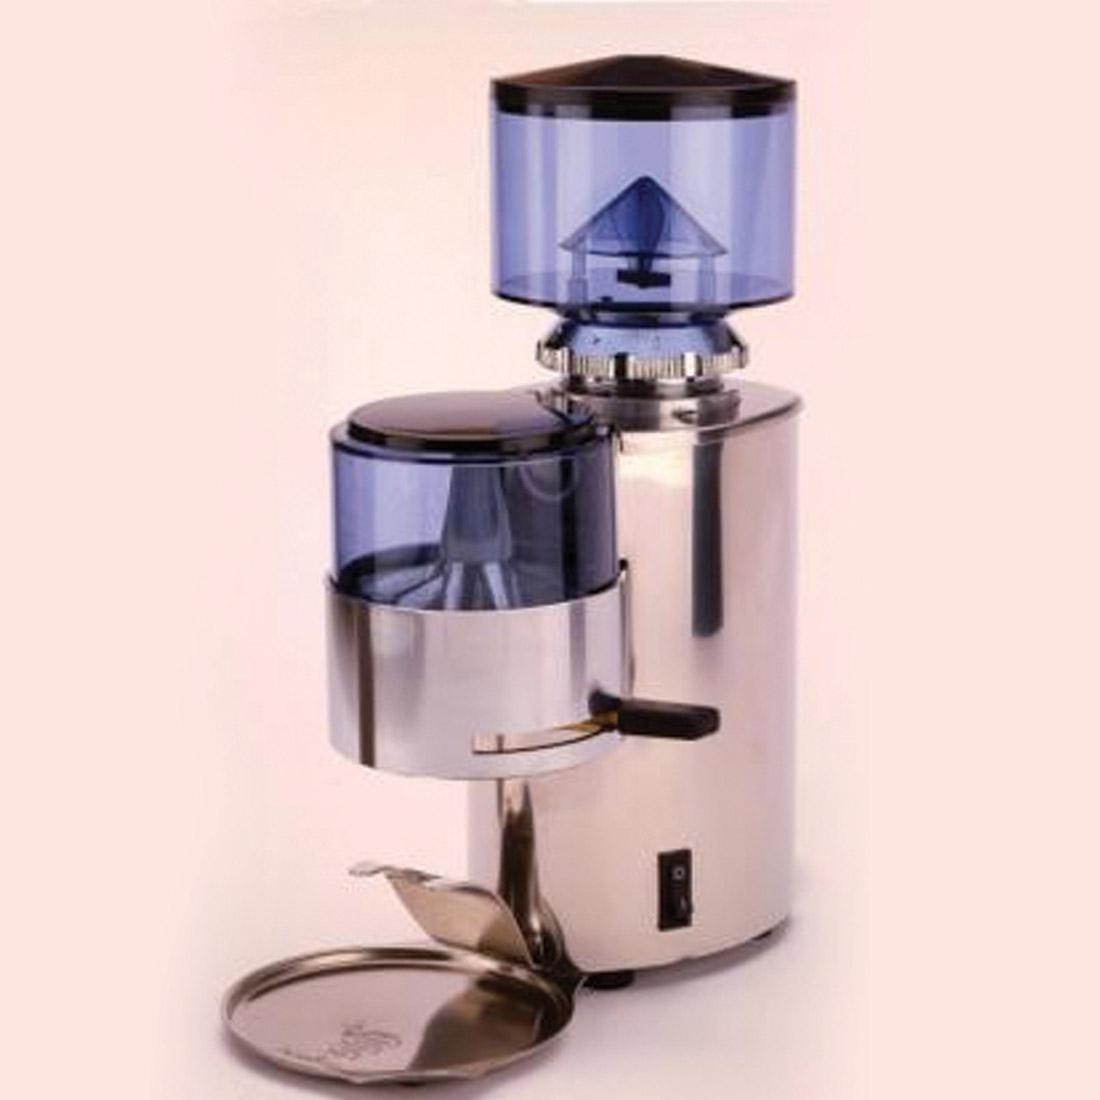 BZBB004M Semi-Automatic Doser Grinder